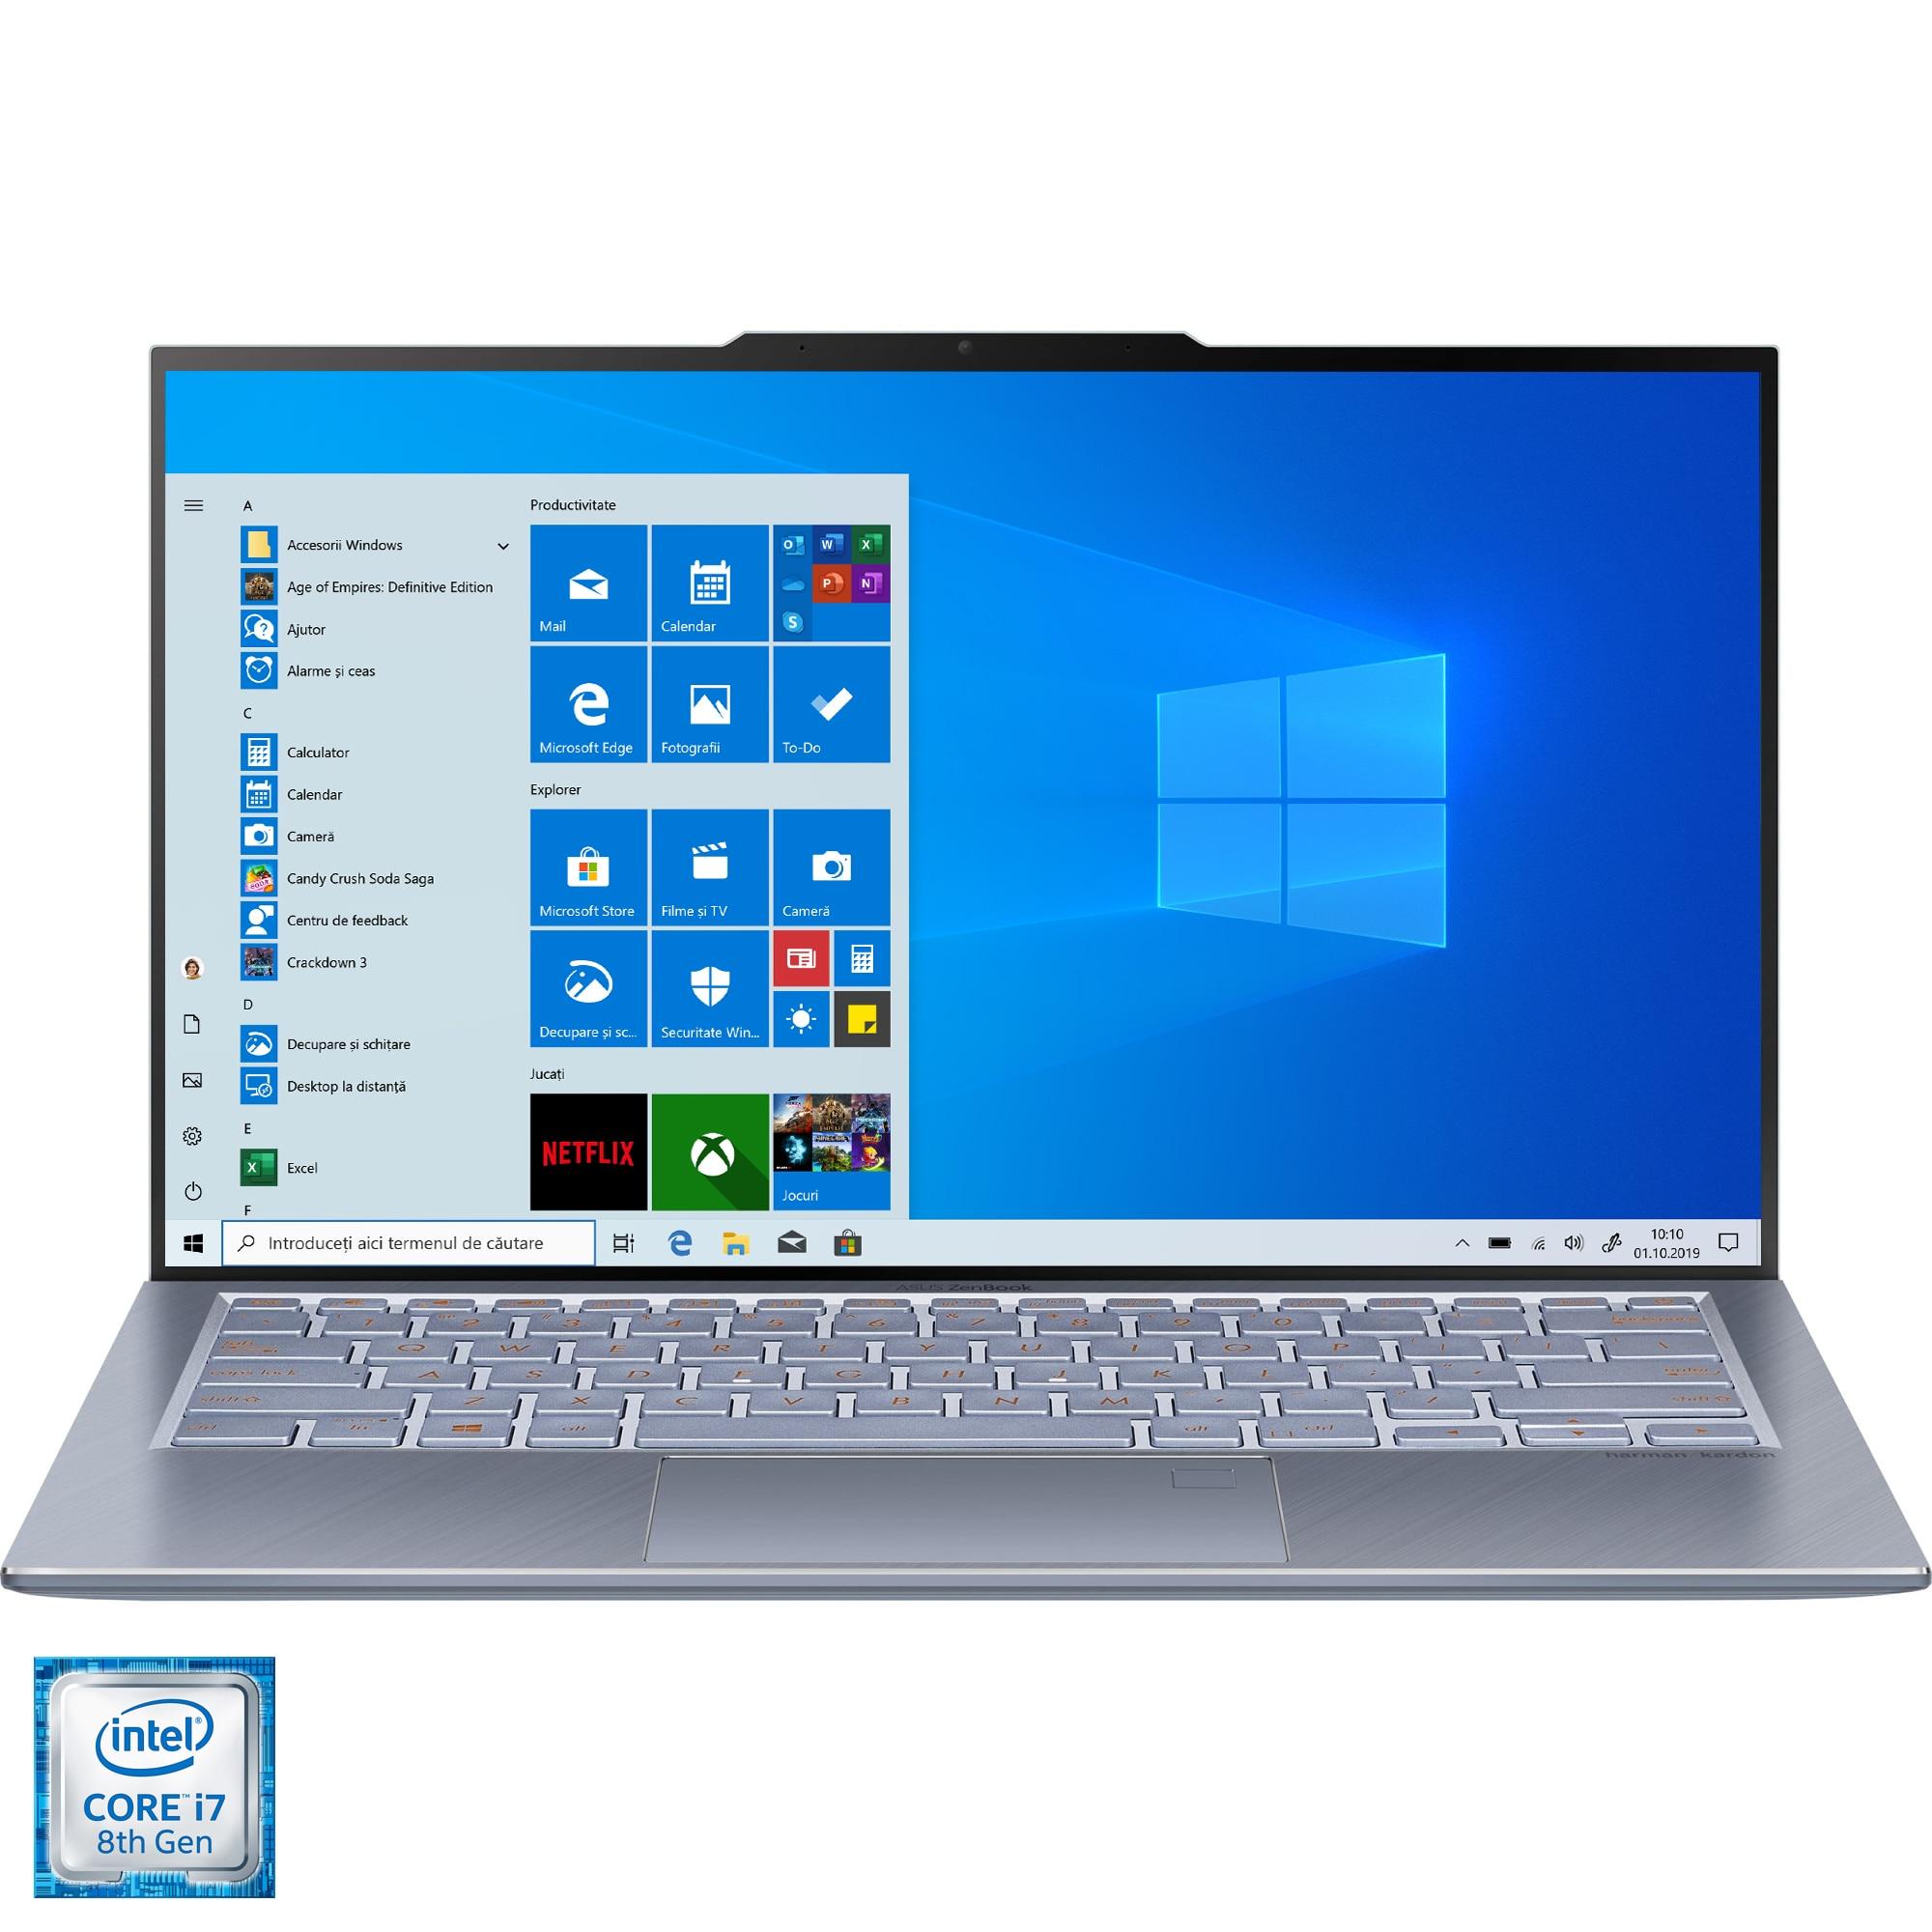 "Fotografie Laptop ultraportabil ASUS ZenBook S13 UX392FN cu procesor Intel® Core™ i7-8565U pana la 4.60 GHz Whiskey Lake, 13.9"", Full HD, 16GB, 512GB SSD, NVIDIA GeForce MX150 2GB, Windows 10 Home, Utopia Blue"